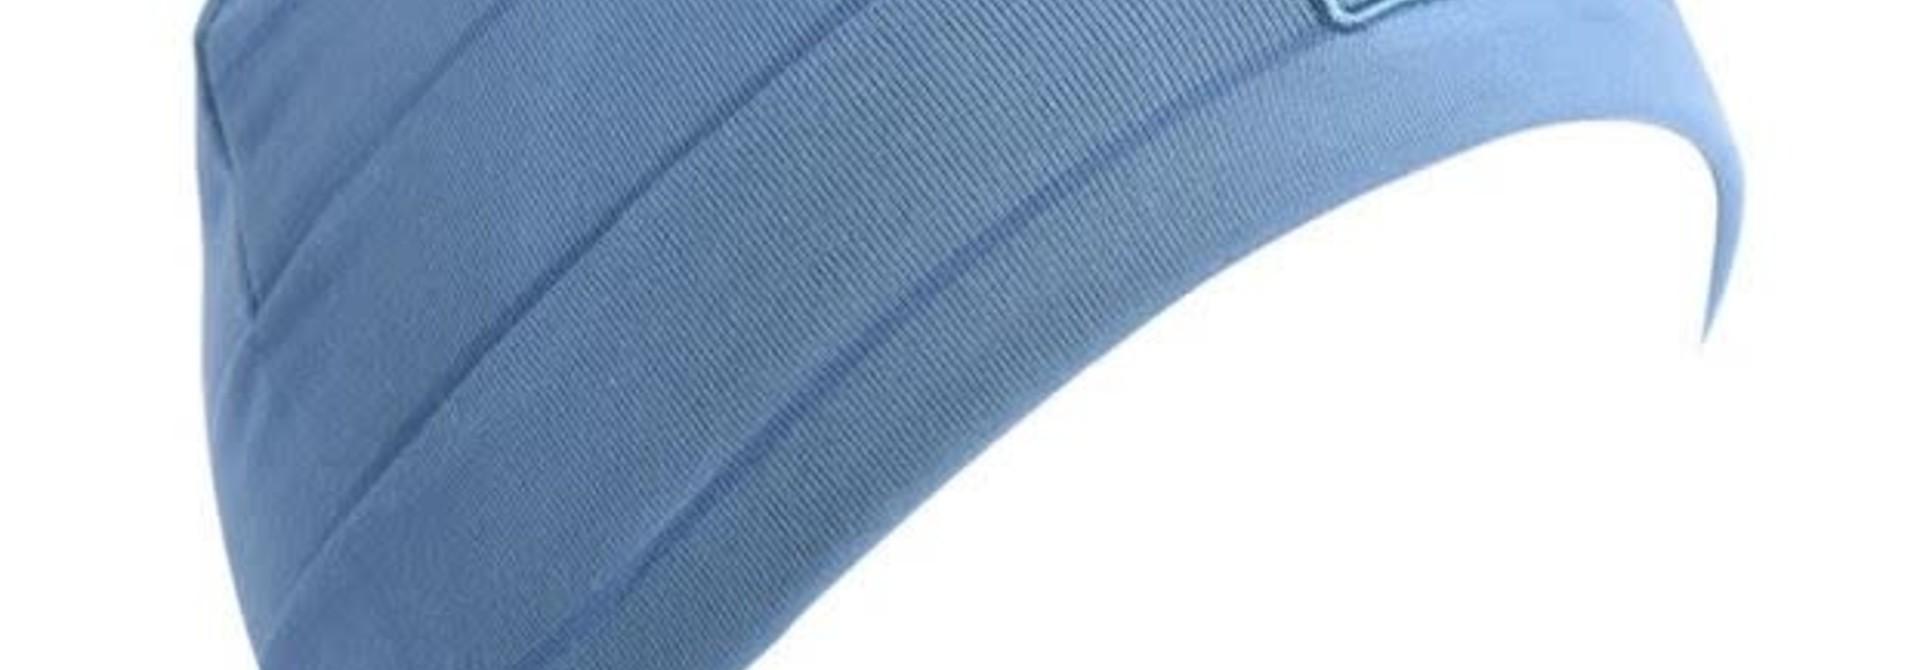 Tuque  Coton - BOSTON V20 Bleu Tendre et Bleu Mer